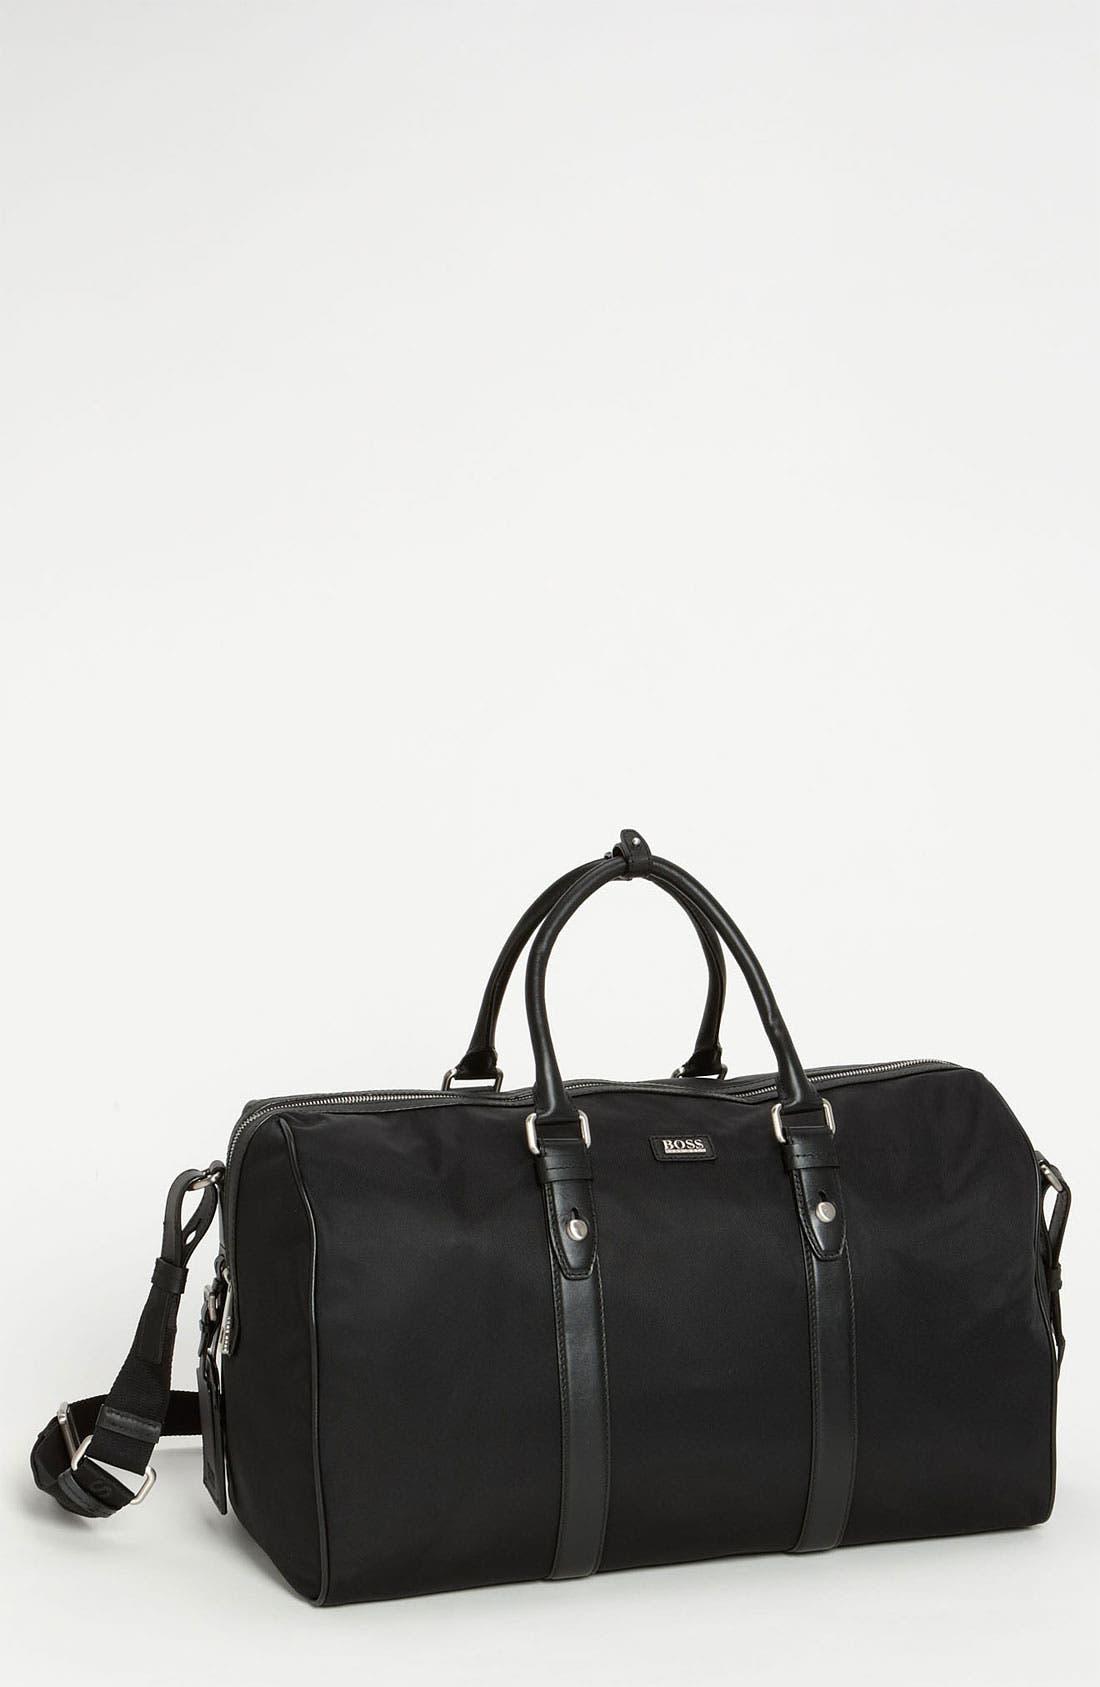 Alternate Image 1 Selected - BOSS Black 'Teddi' Duffel Bag